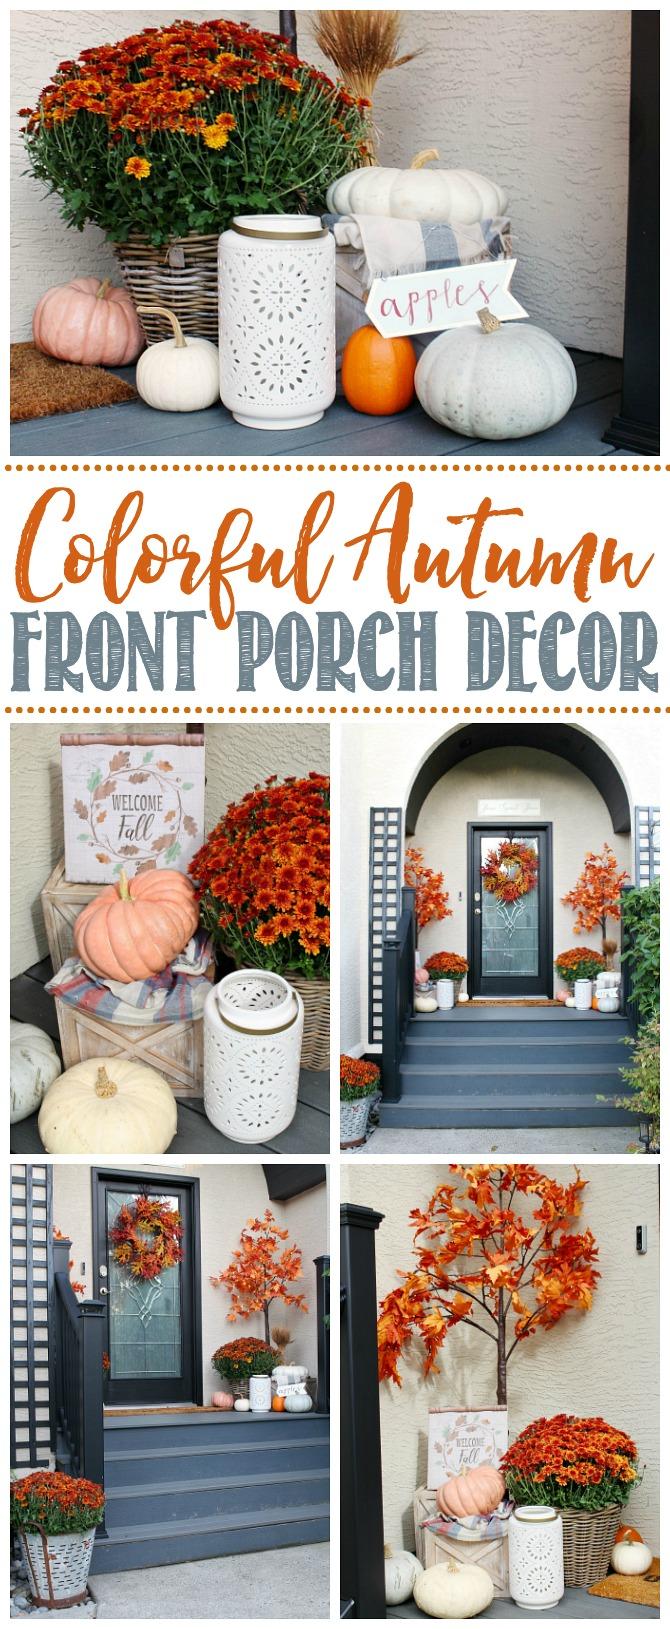 Colorful fall front porch decor ideas.